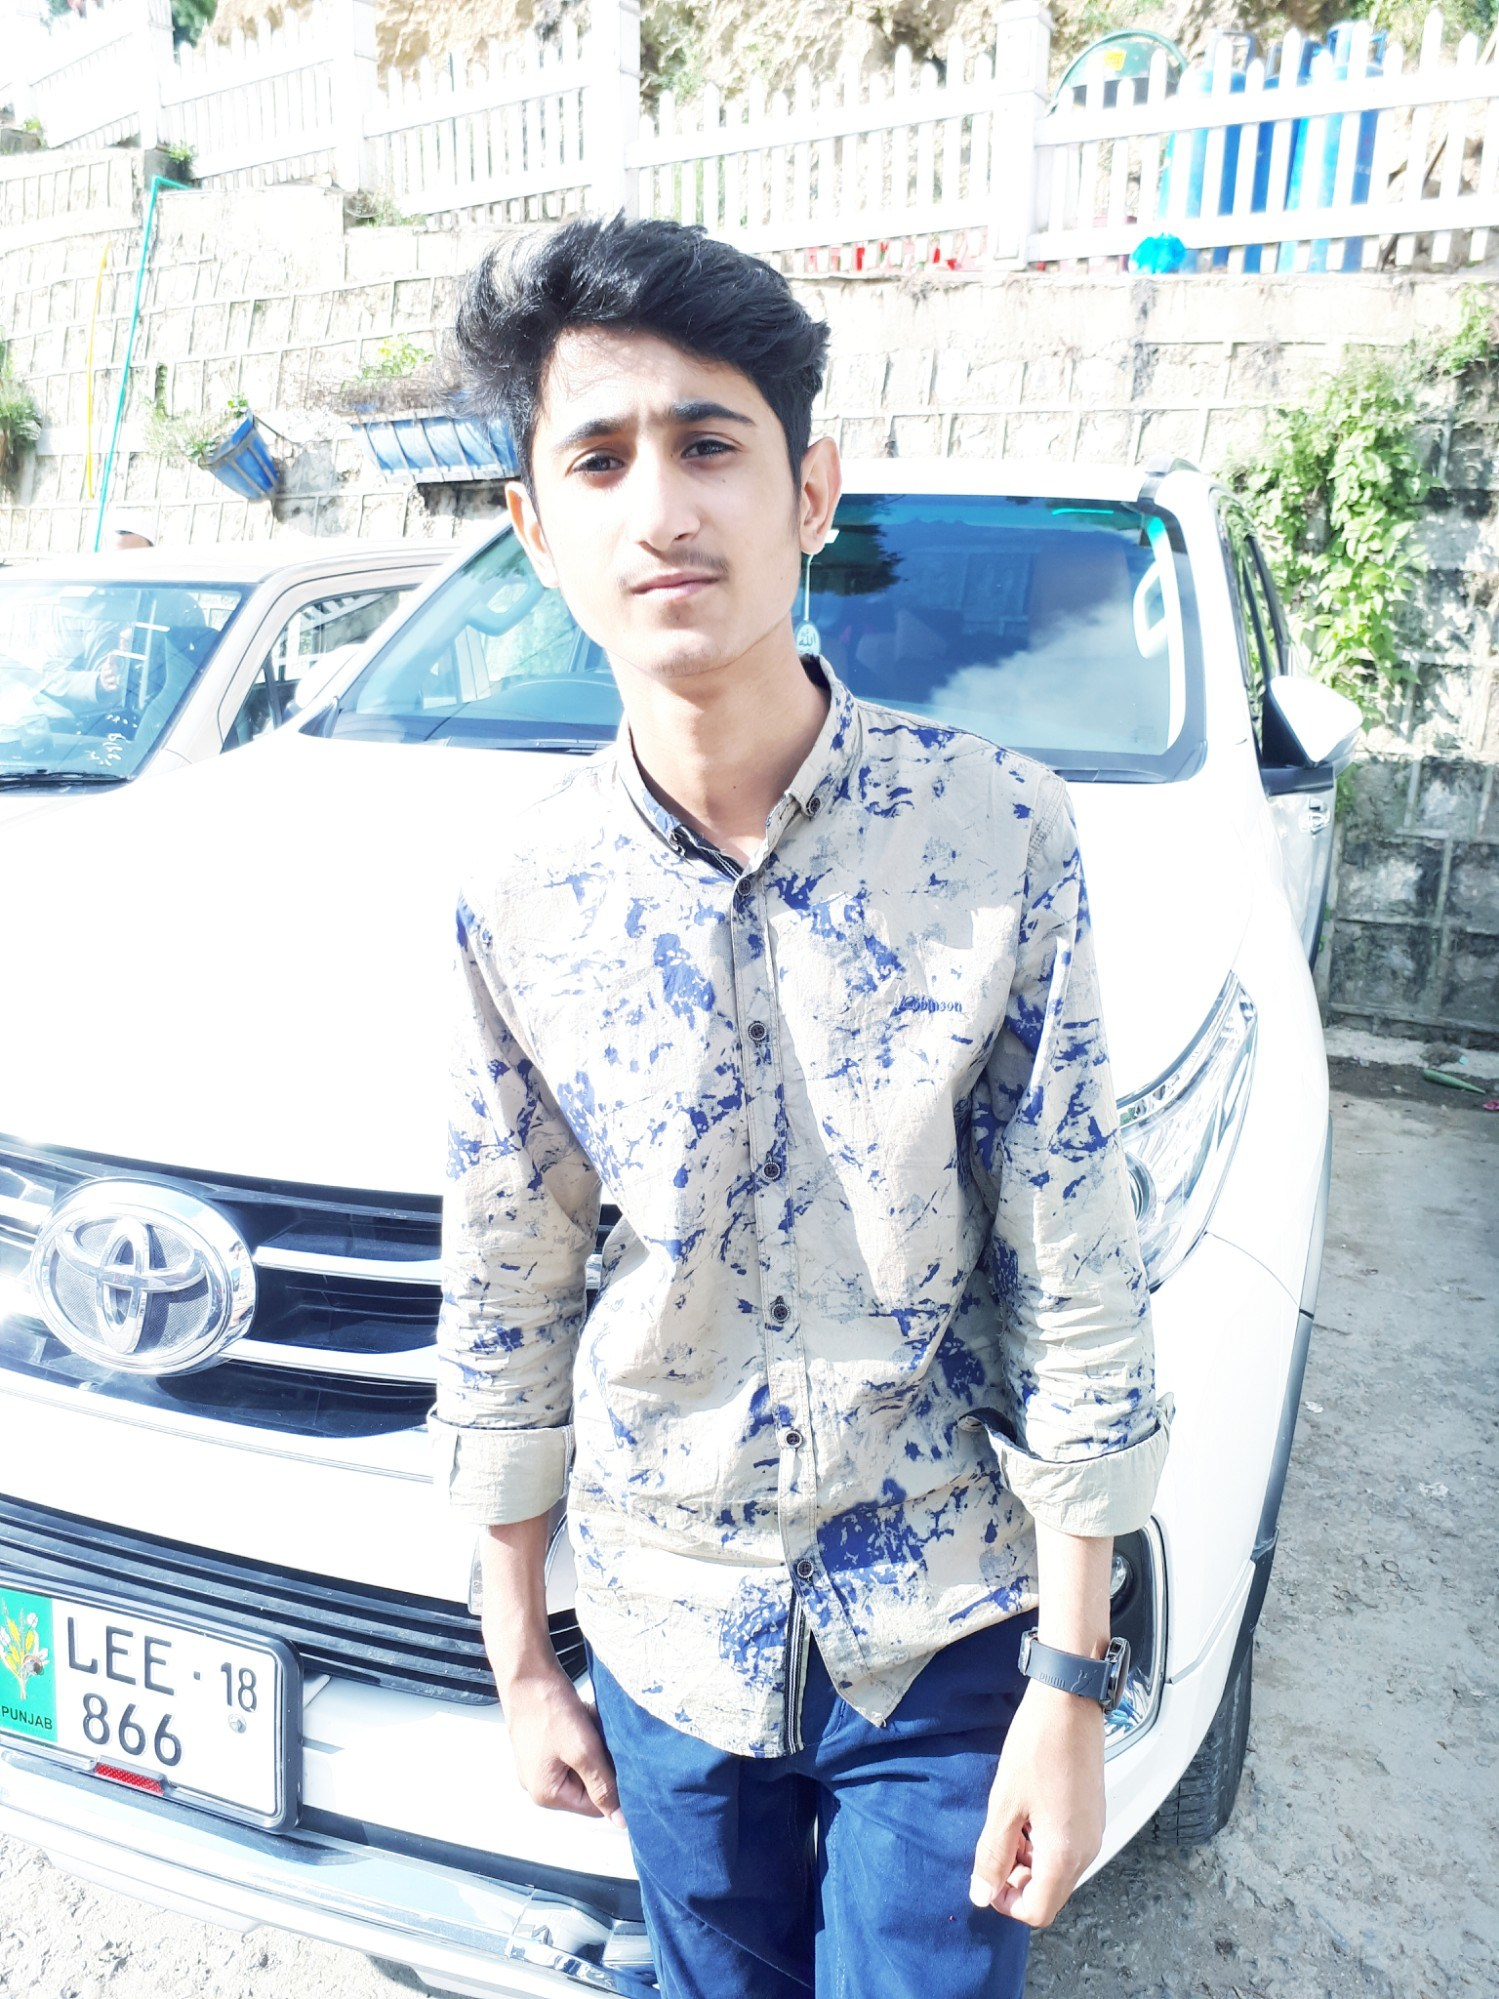 Wasiqkhanbaloch's Cover Photo